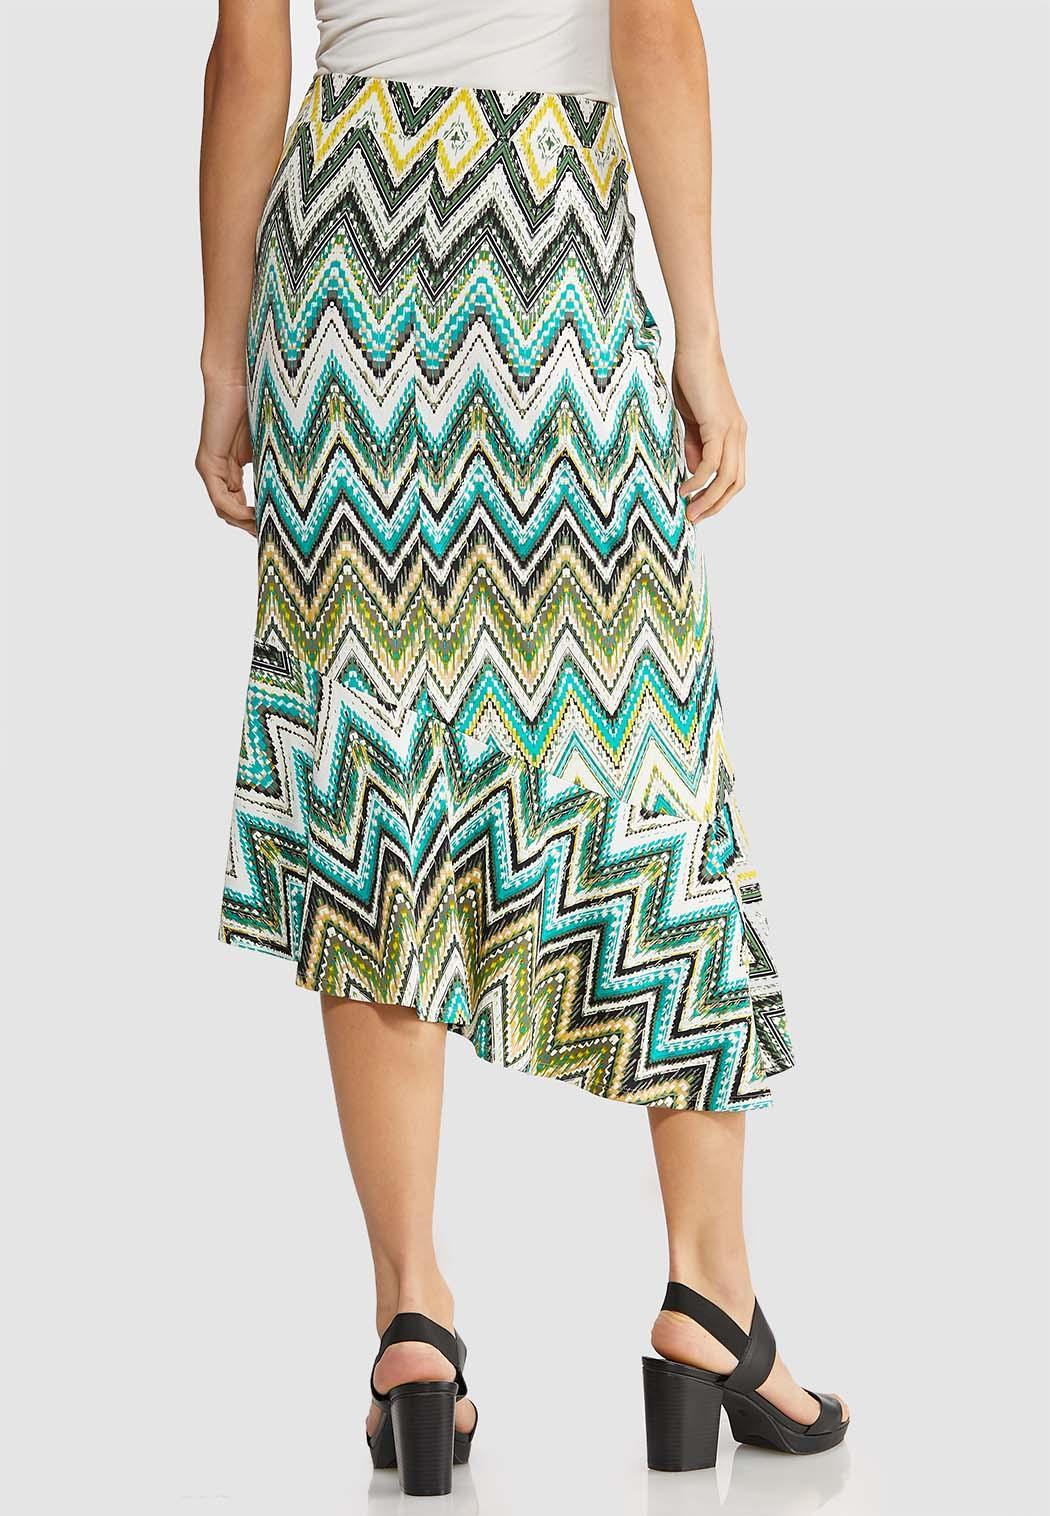 Plus Size Asymmetrical Chevron Skirt (Item #43893274)